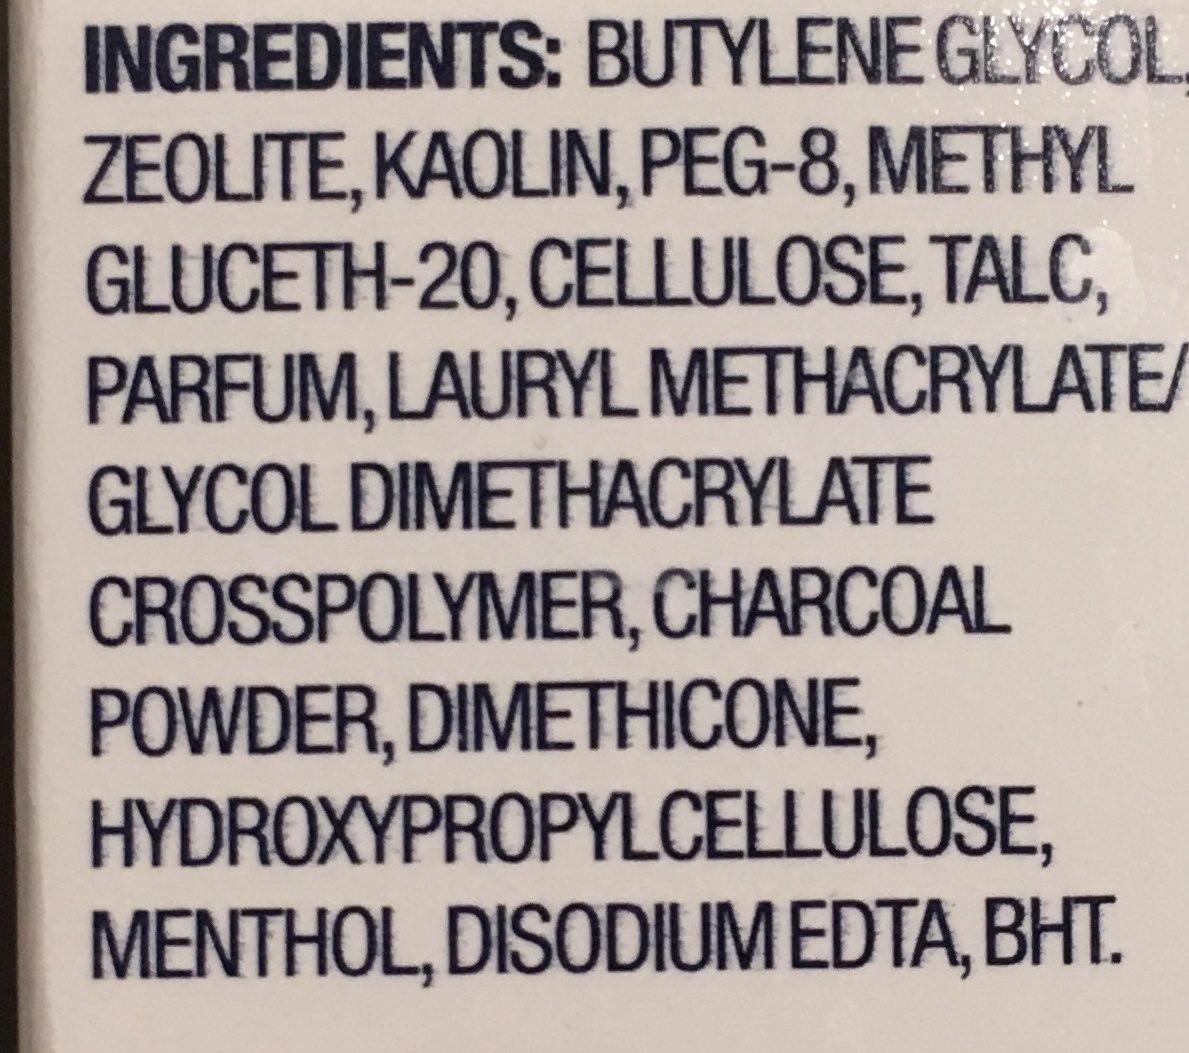 Masque auto-chauffant au charbon - Ingredients - fr